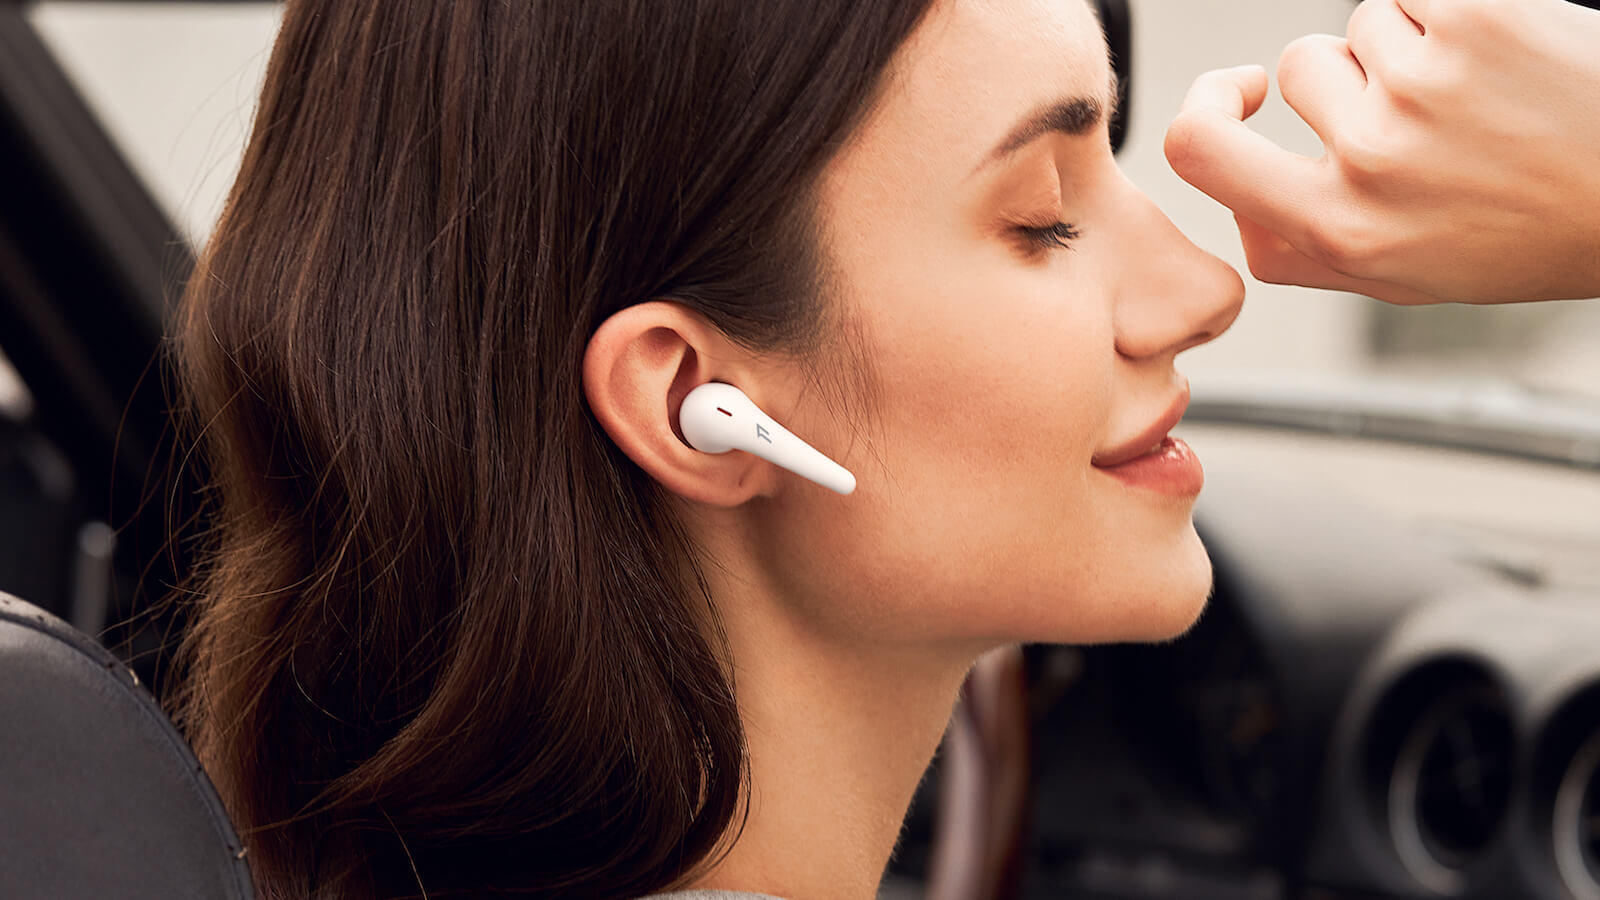 1MORE-ComfoBuds-Pro-wireless-ergonomic-headphones-01.jpg